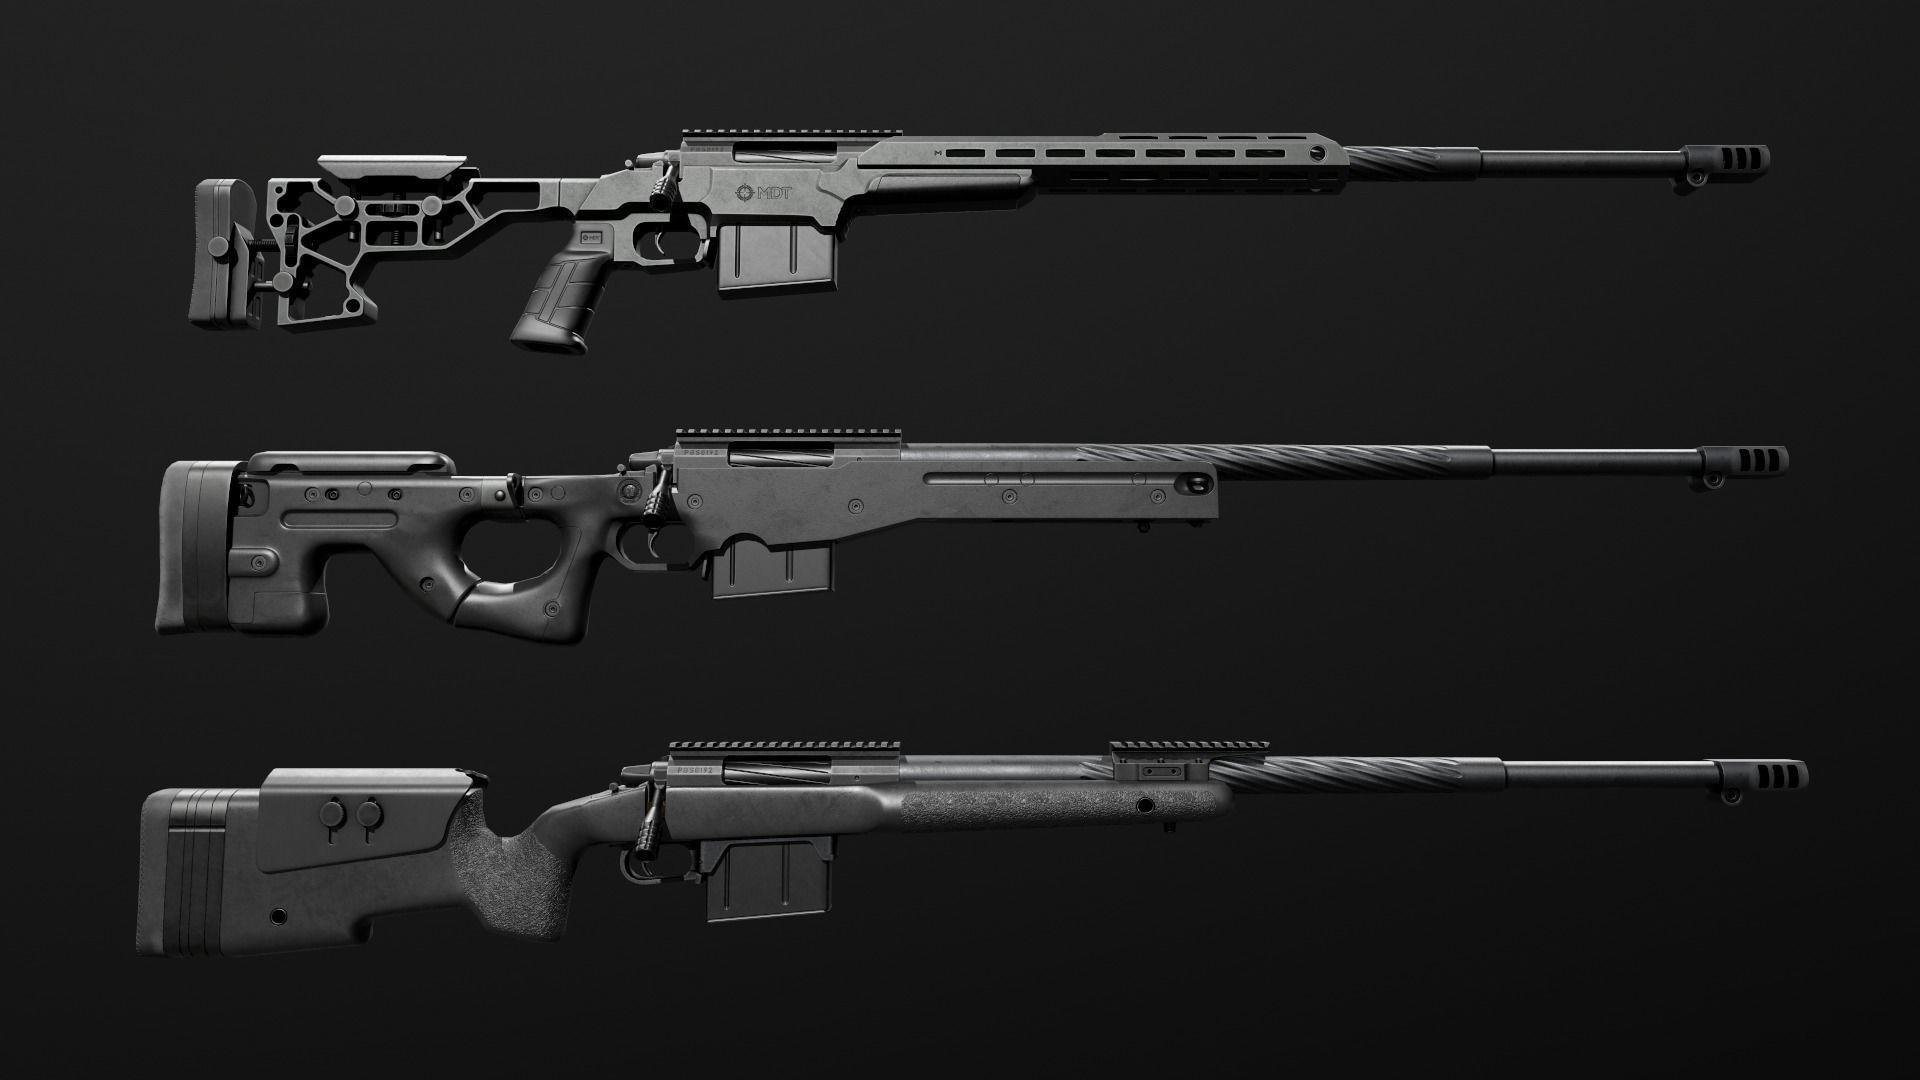 Remington 700 Sniper Rifle